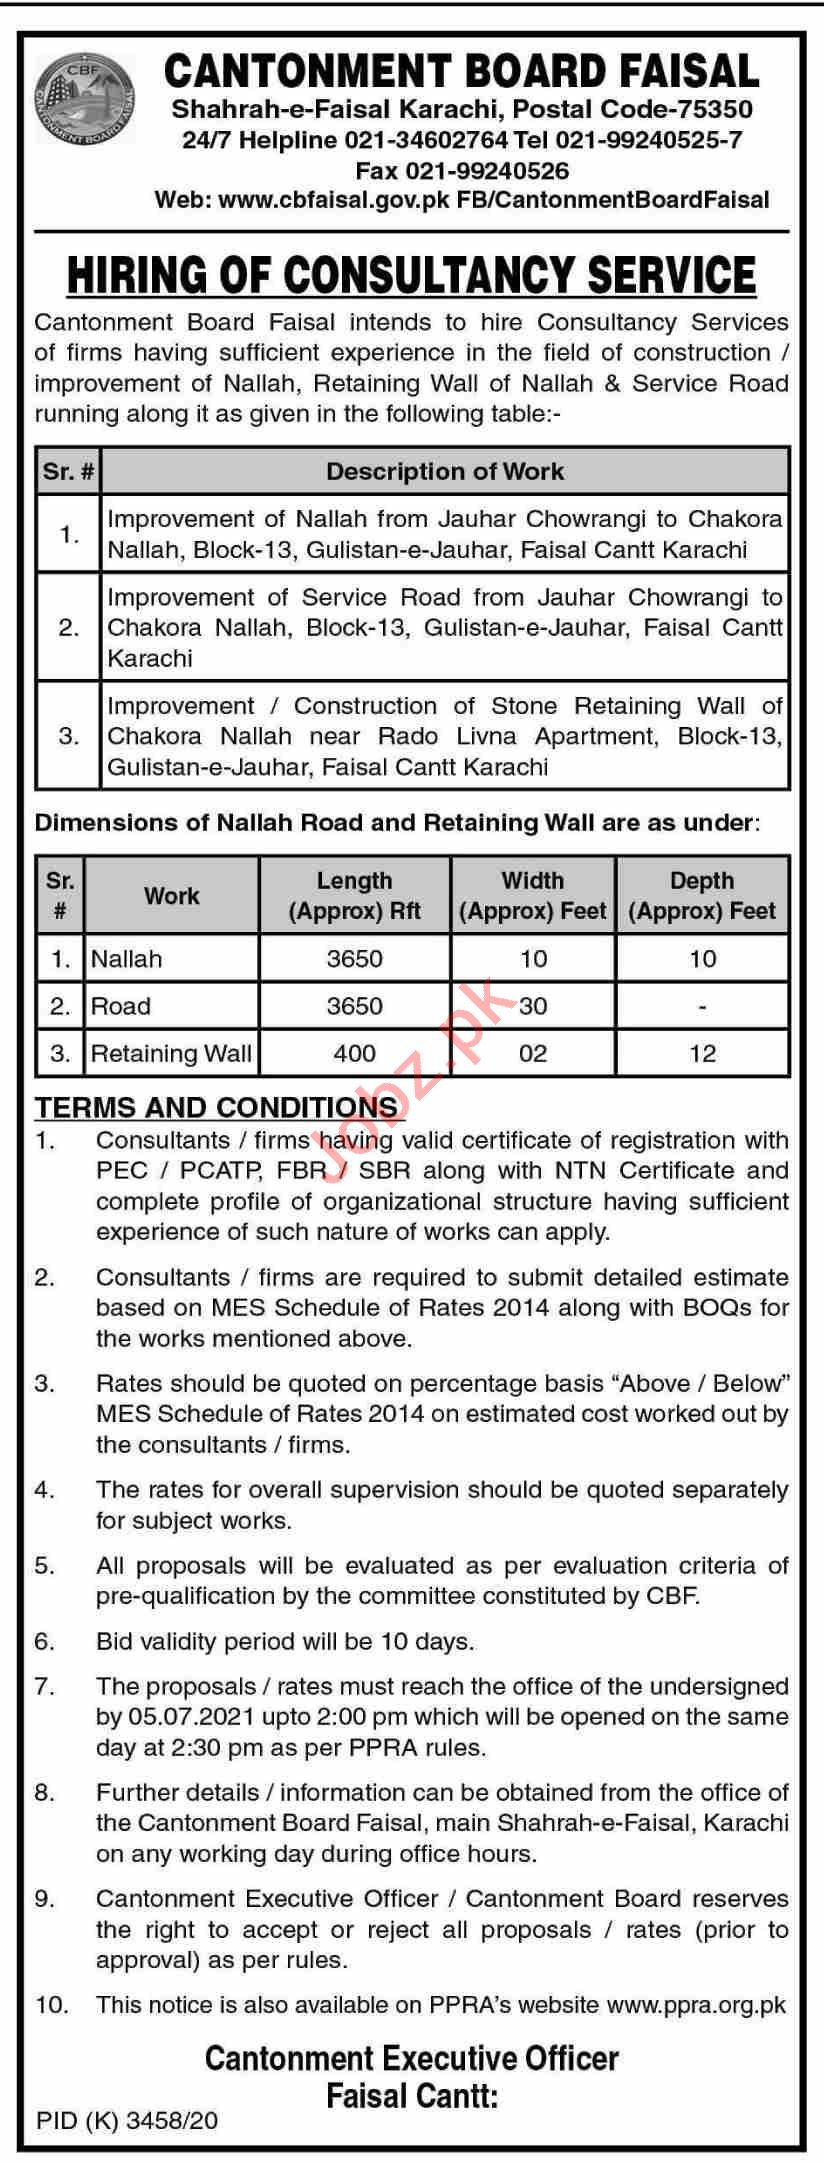 Cantonment Board Faisal CBF Karachi Jobs 2021 for Consultant